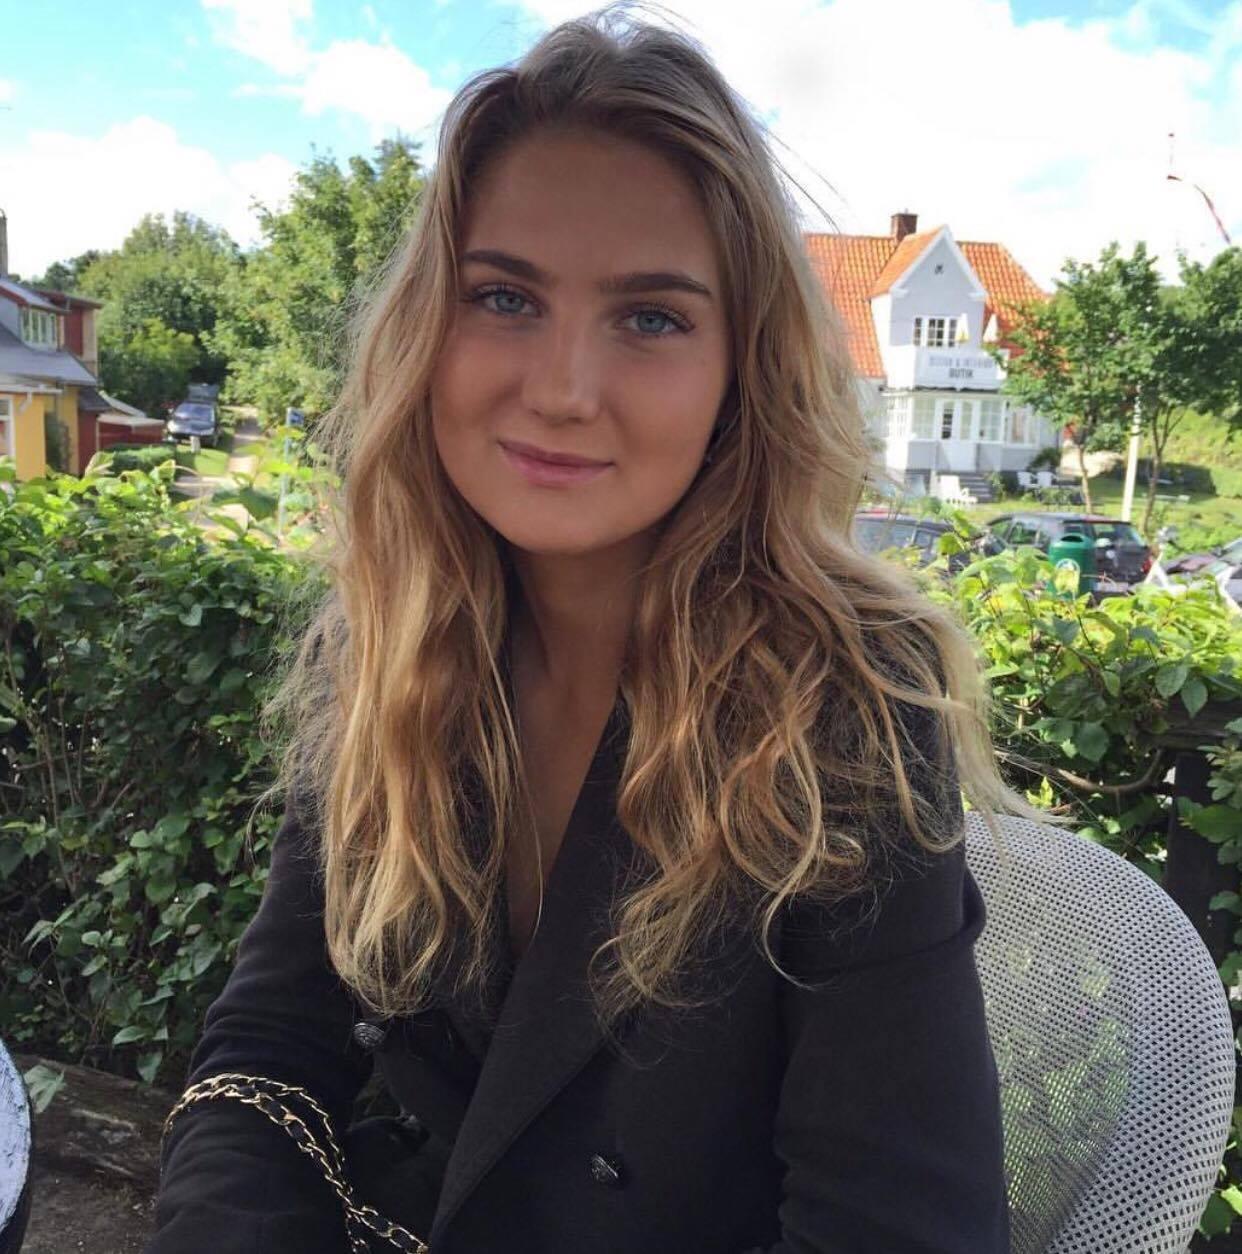 Au Pair Profile Matilde Koefoed Aged 18 Gender Female Nationality Danish Location 2100 Copenhagen Denmark Membership No 728844